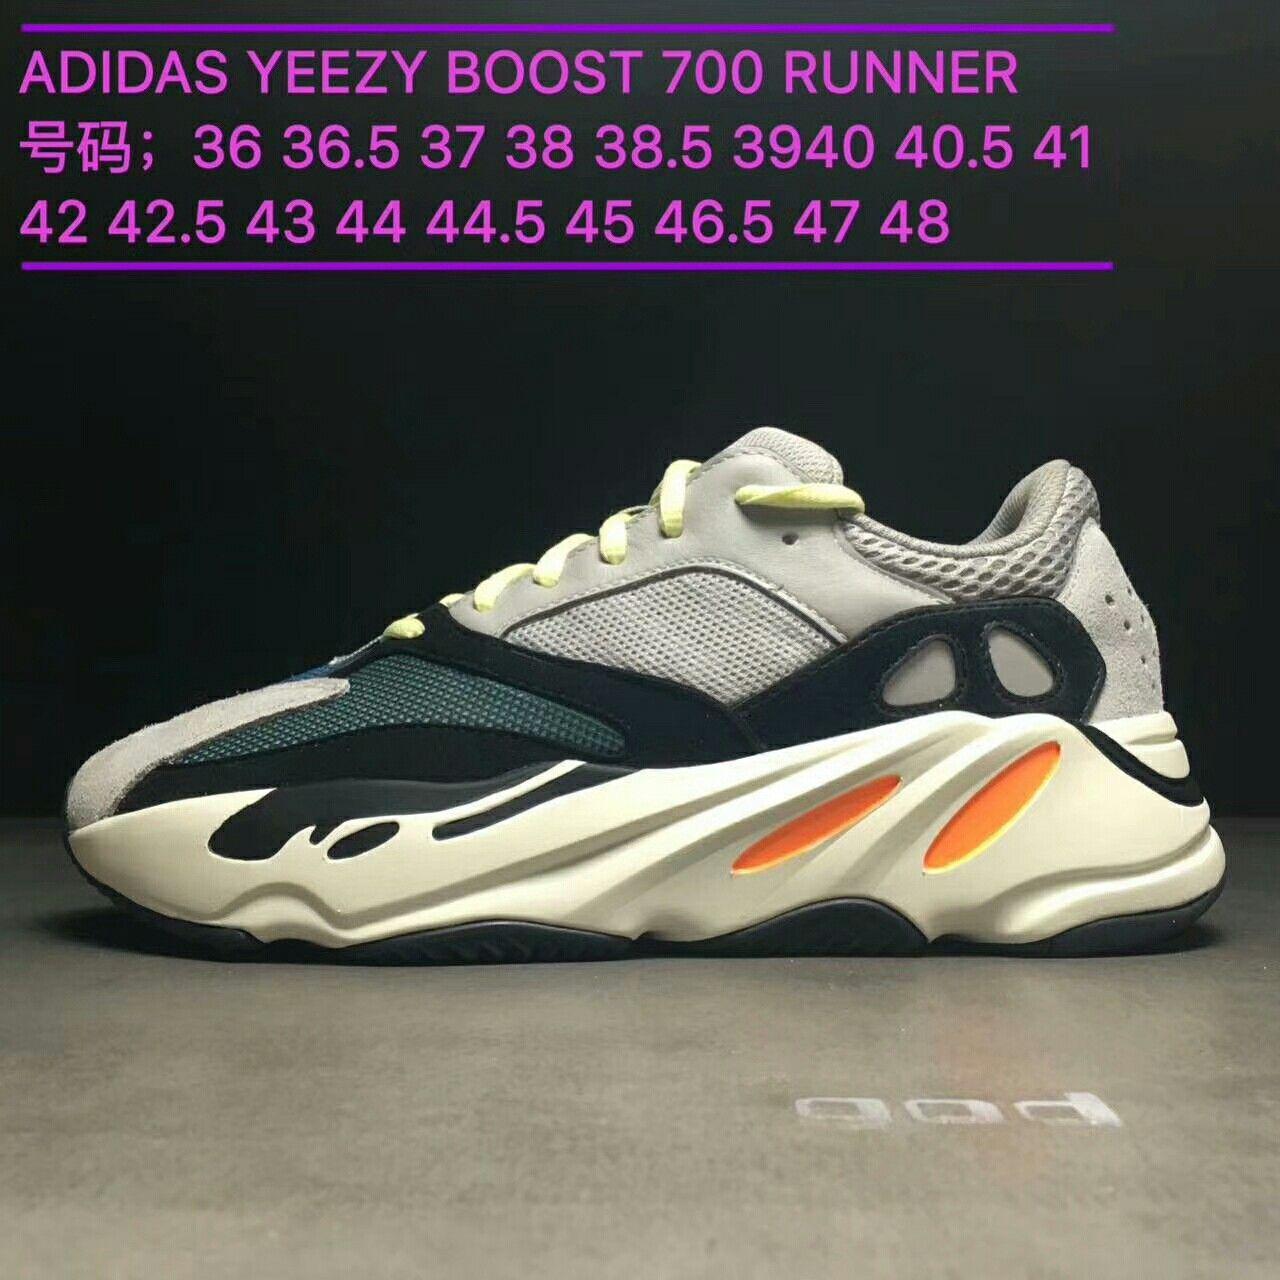 adidas Yeezy Boost 700 Runner / Size 36 - 48